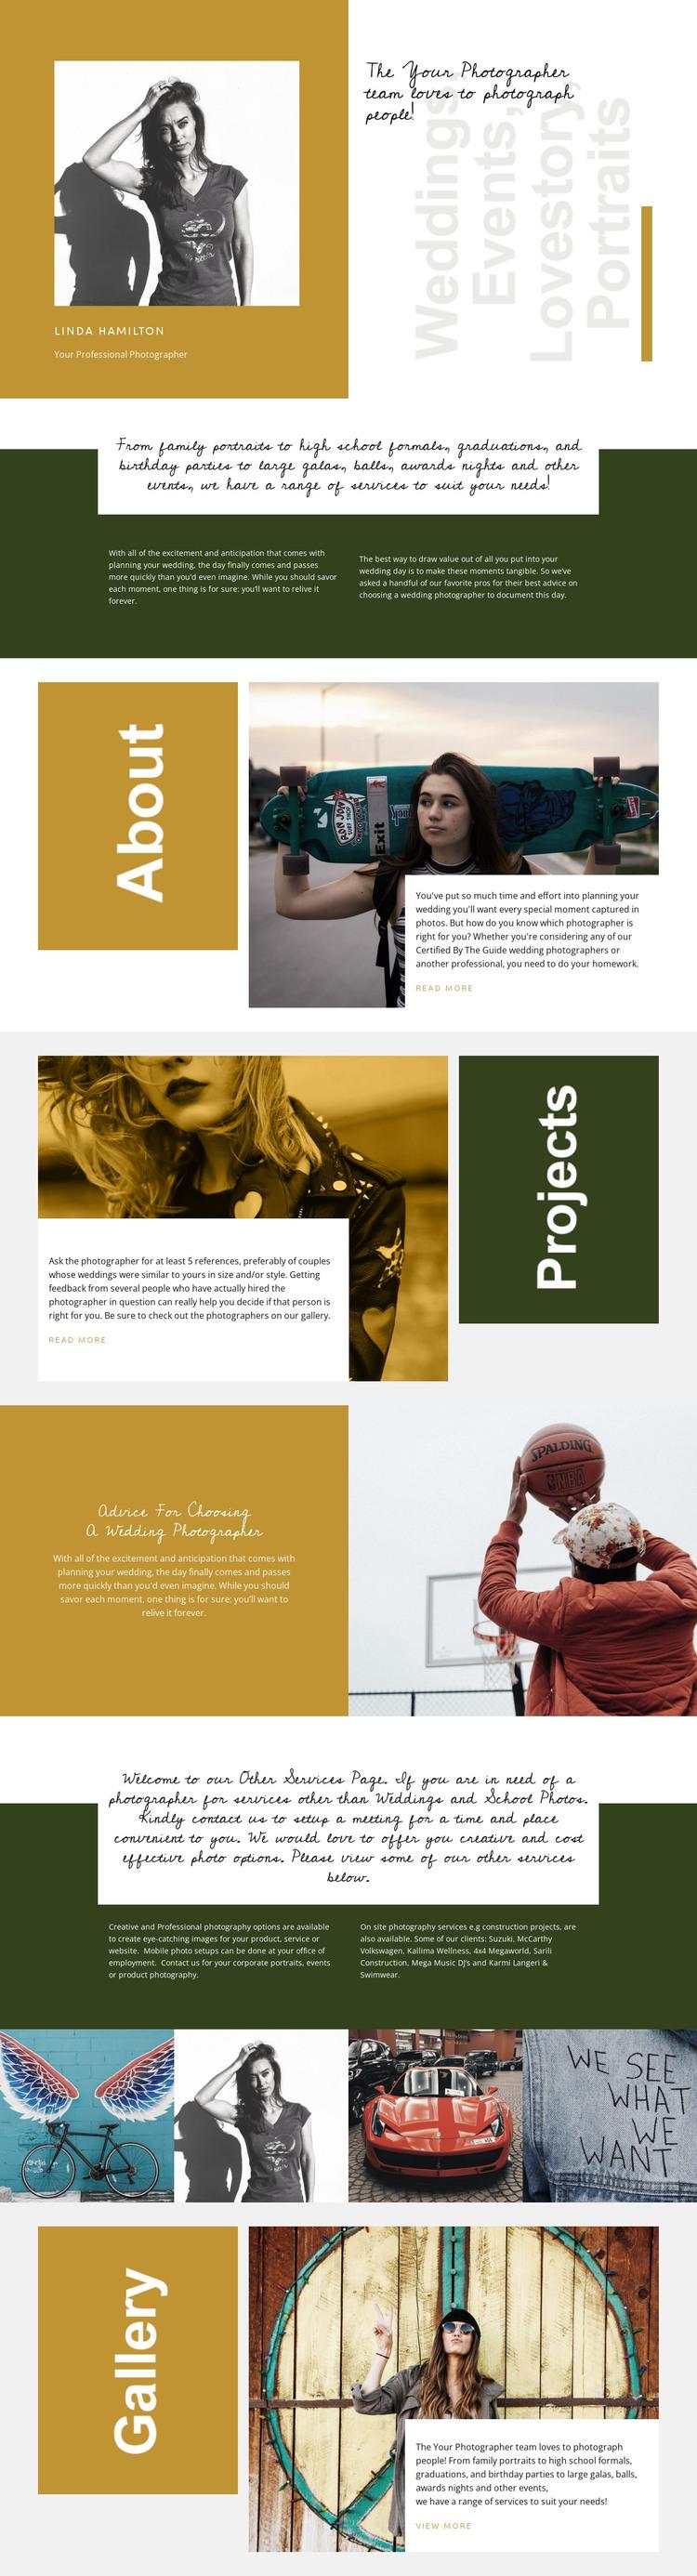 Fashion photography courses Web Design